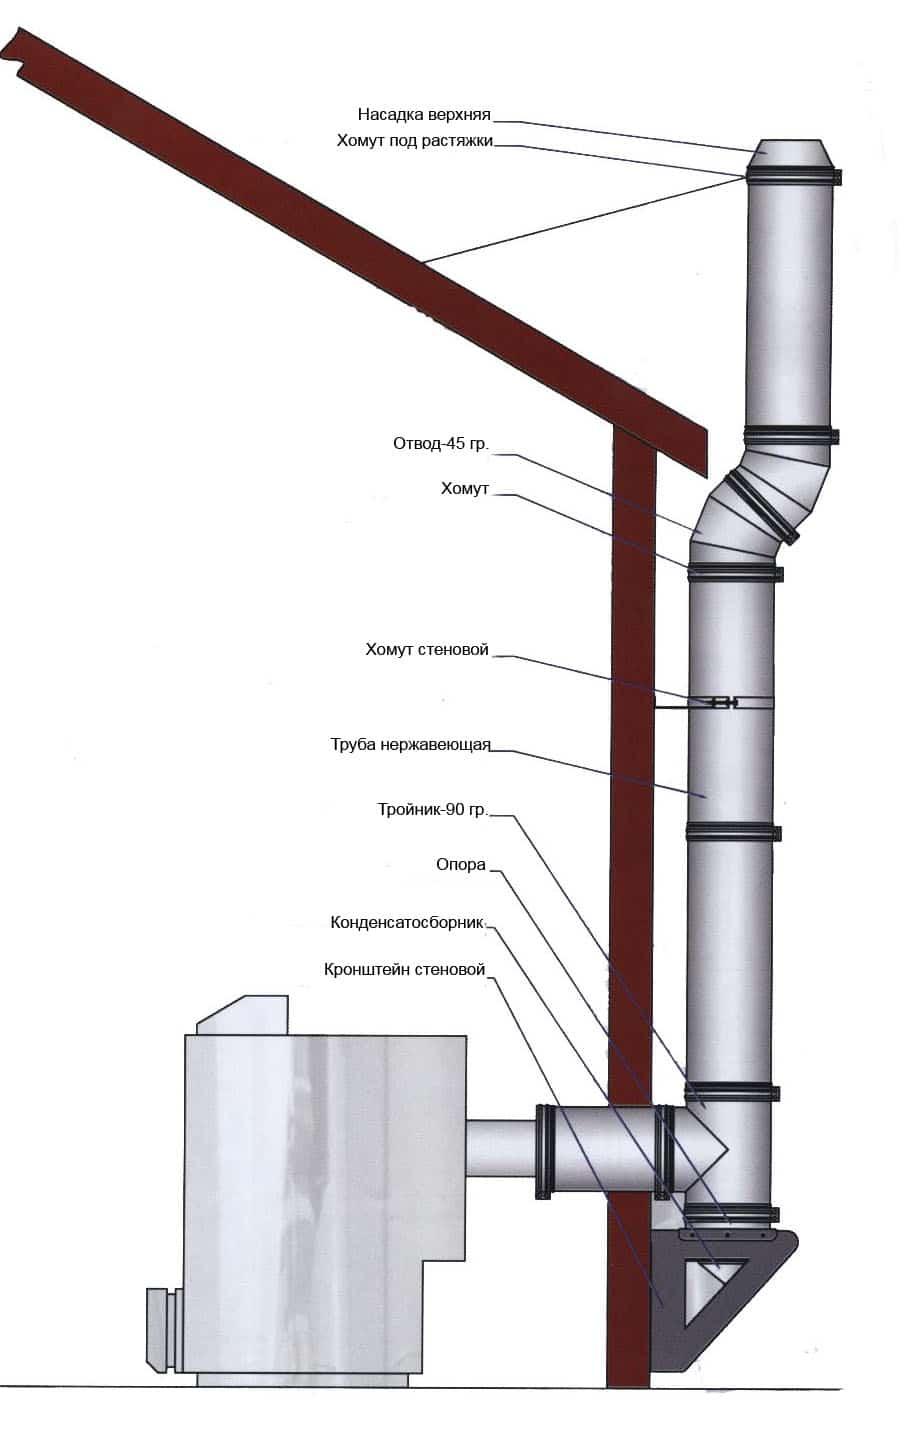 Схема установки дымохода через стену